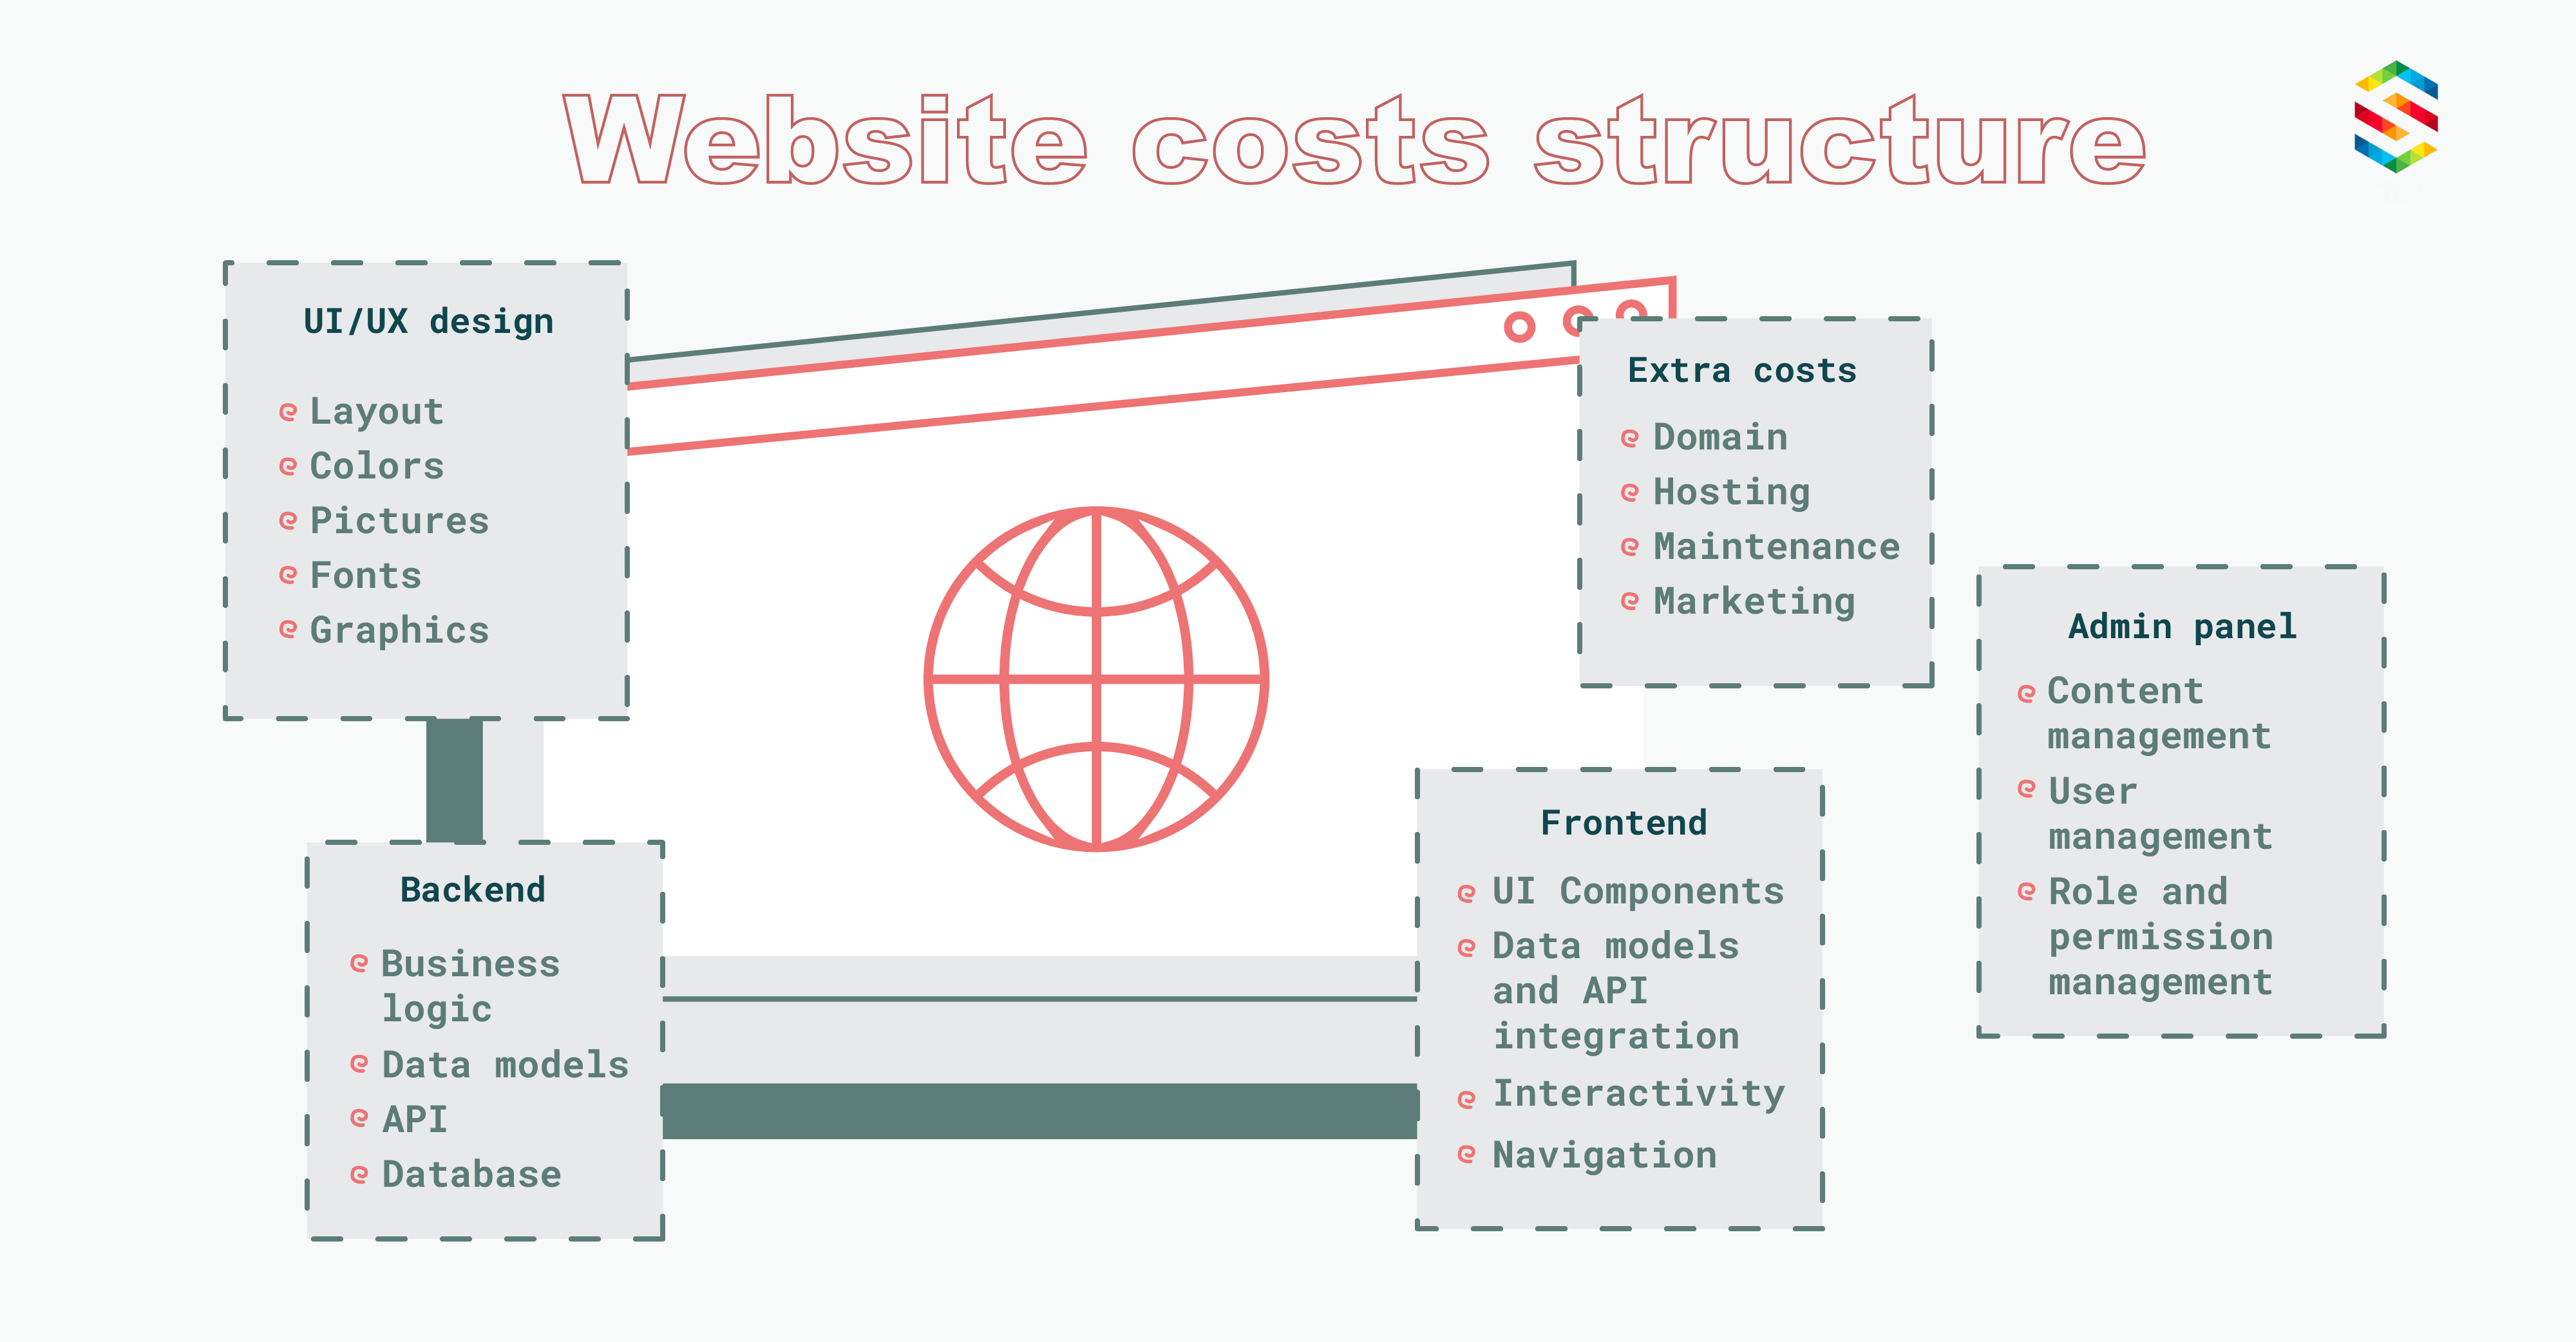 Website costs structure